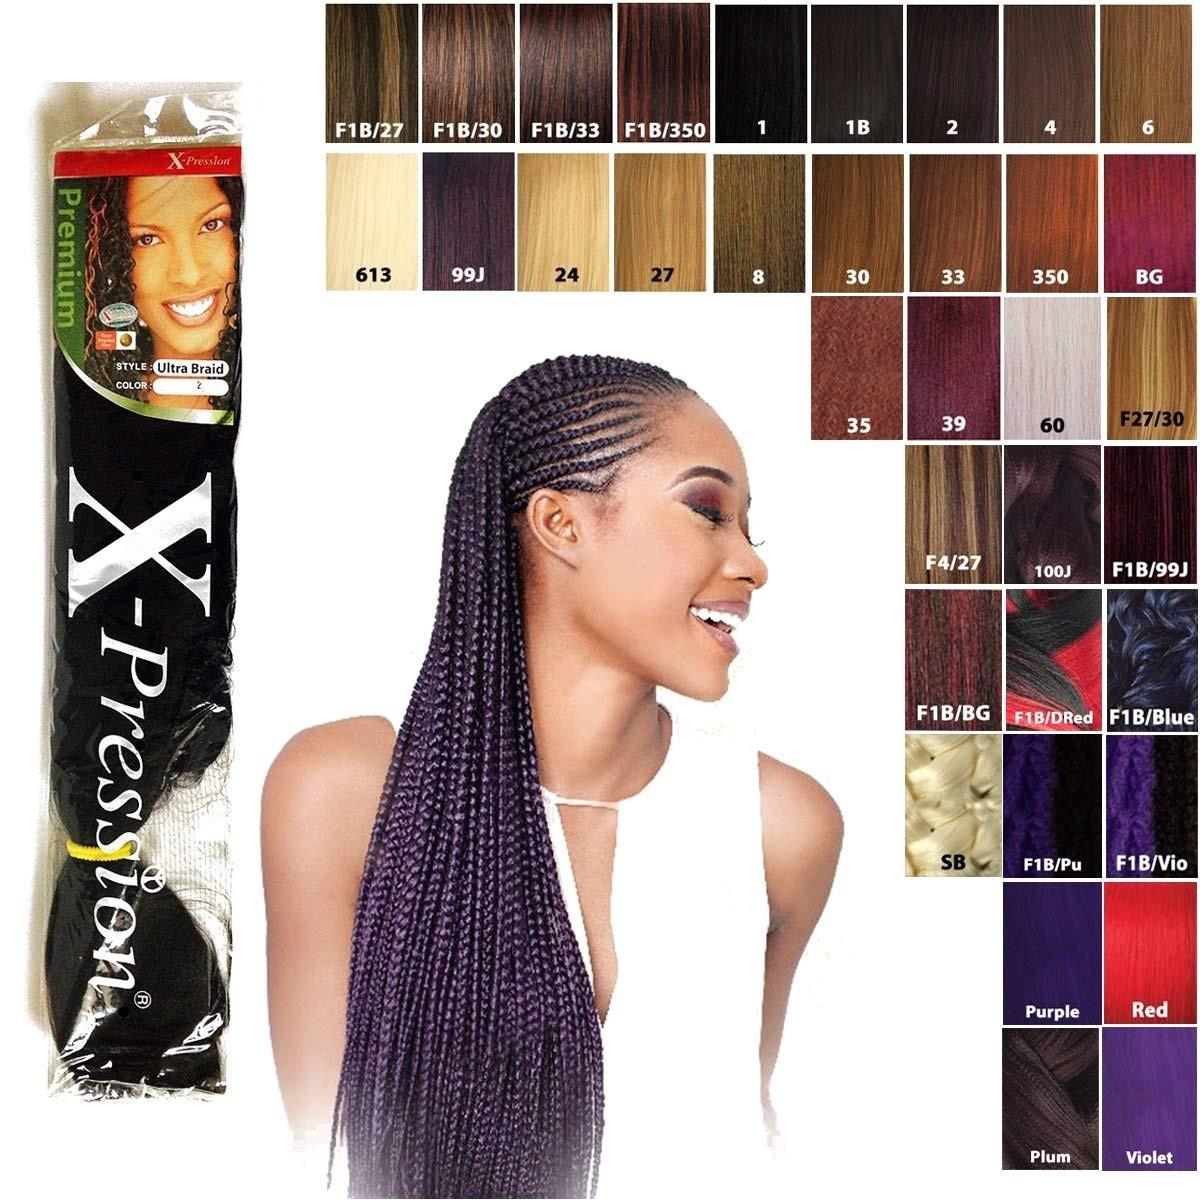 Amazon X pression Premium Original Ultra Braid Colour 2 [Misc ] Beauty